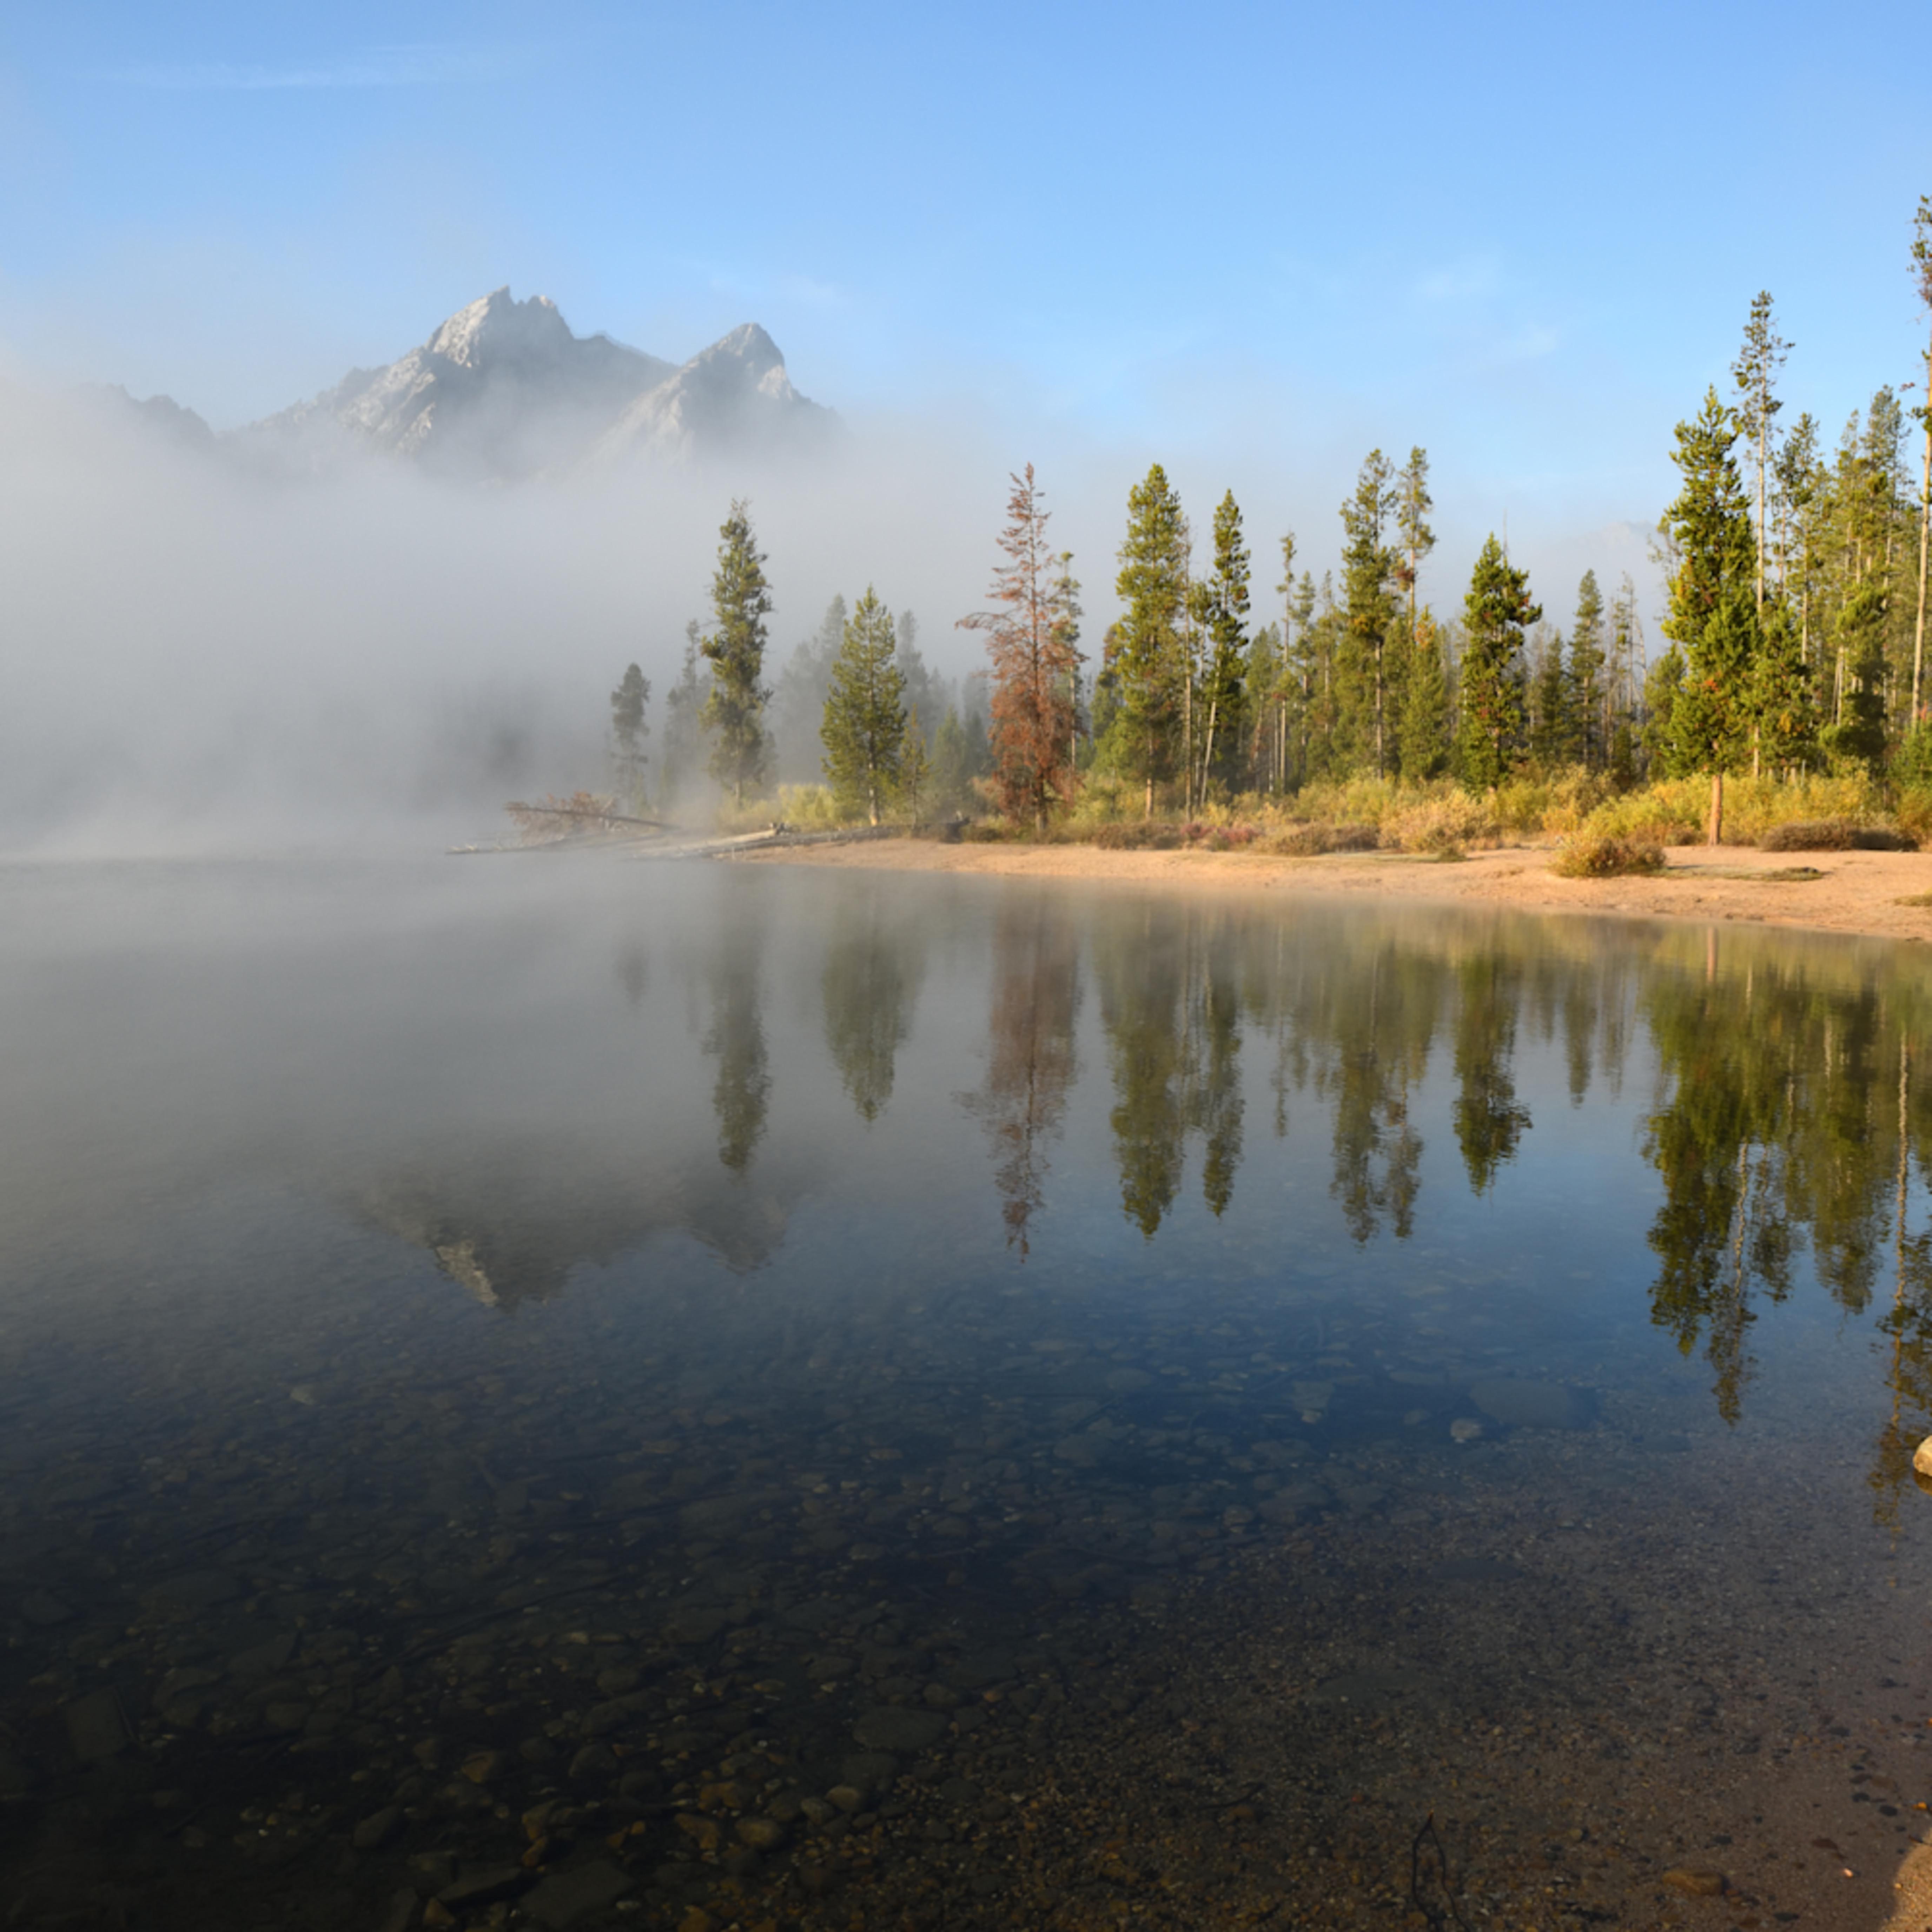 D85 3575 stanley lake mt mcgowin misty mountains hr ns asf p8bnba